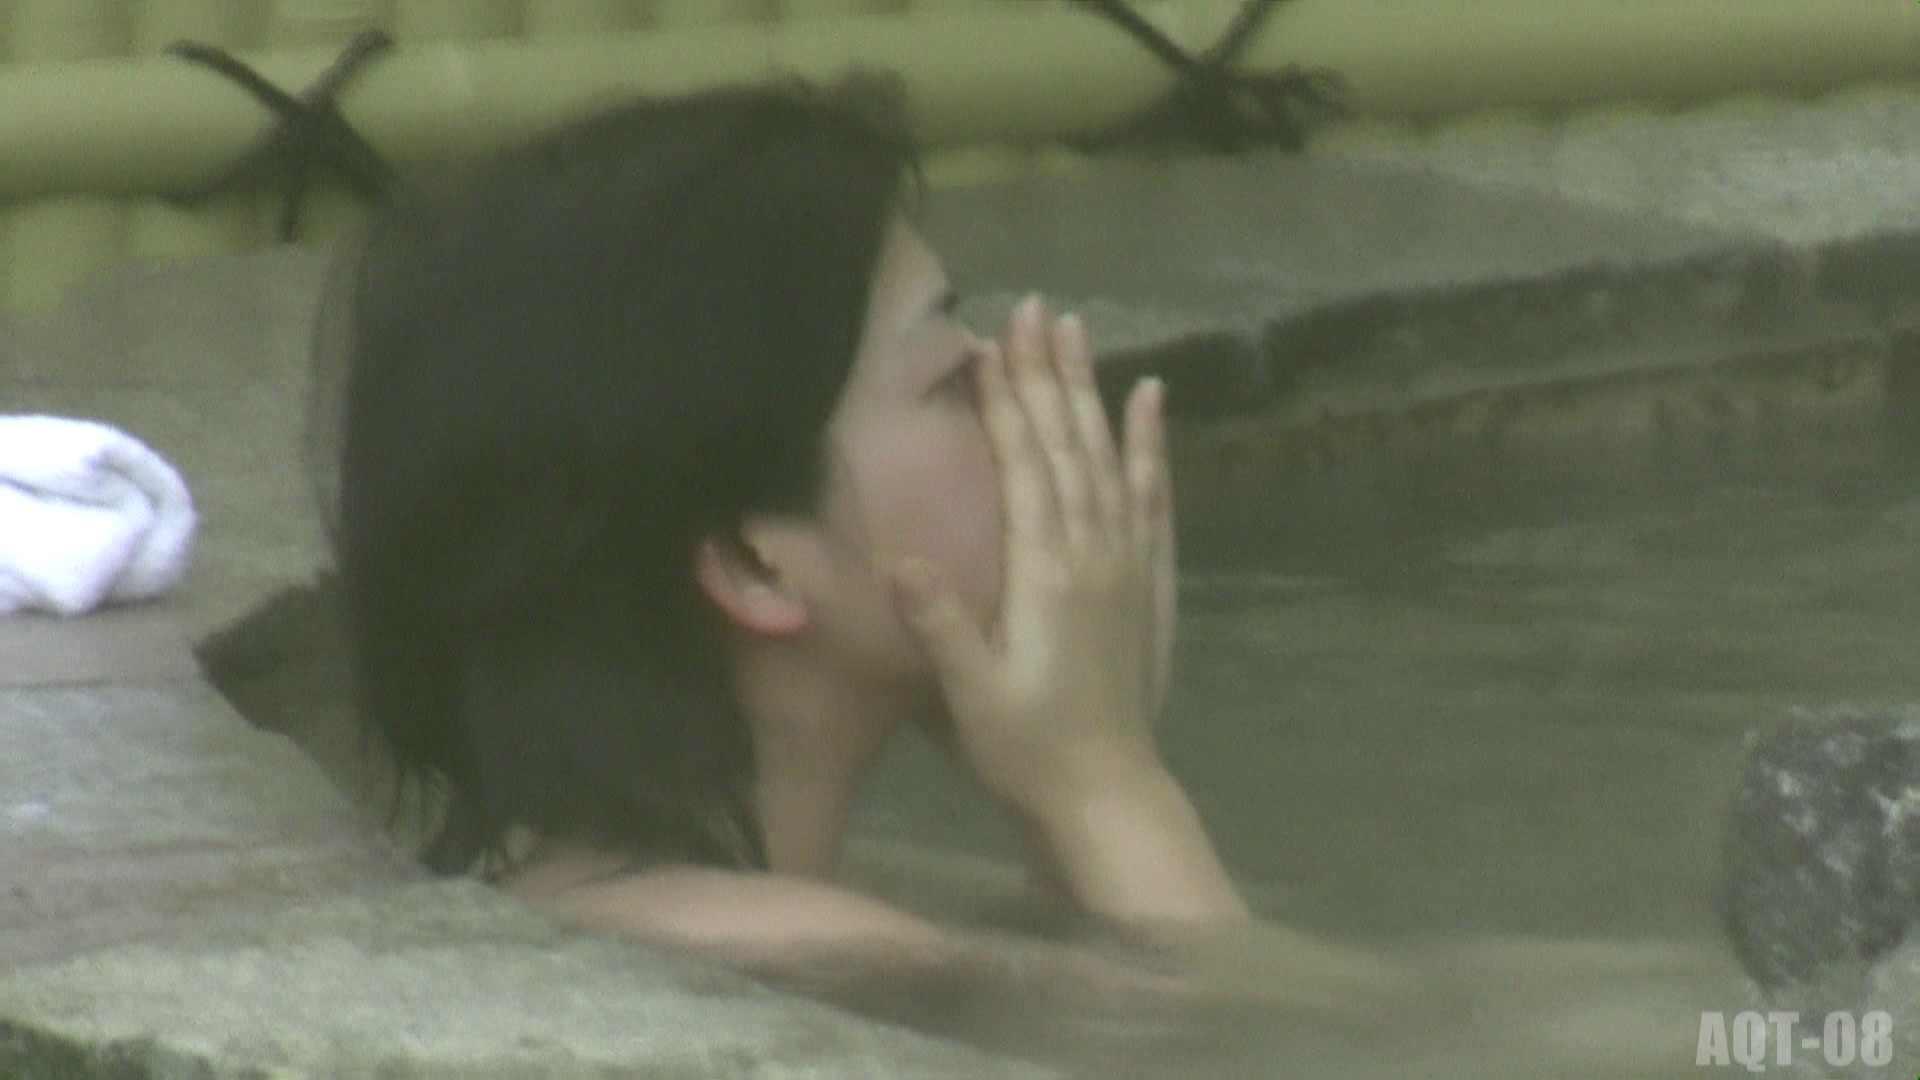 Aquaな露天風呂Vol.776 盗撮 エロ無料画像 108画像 8